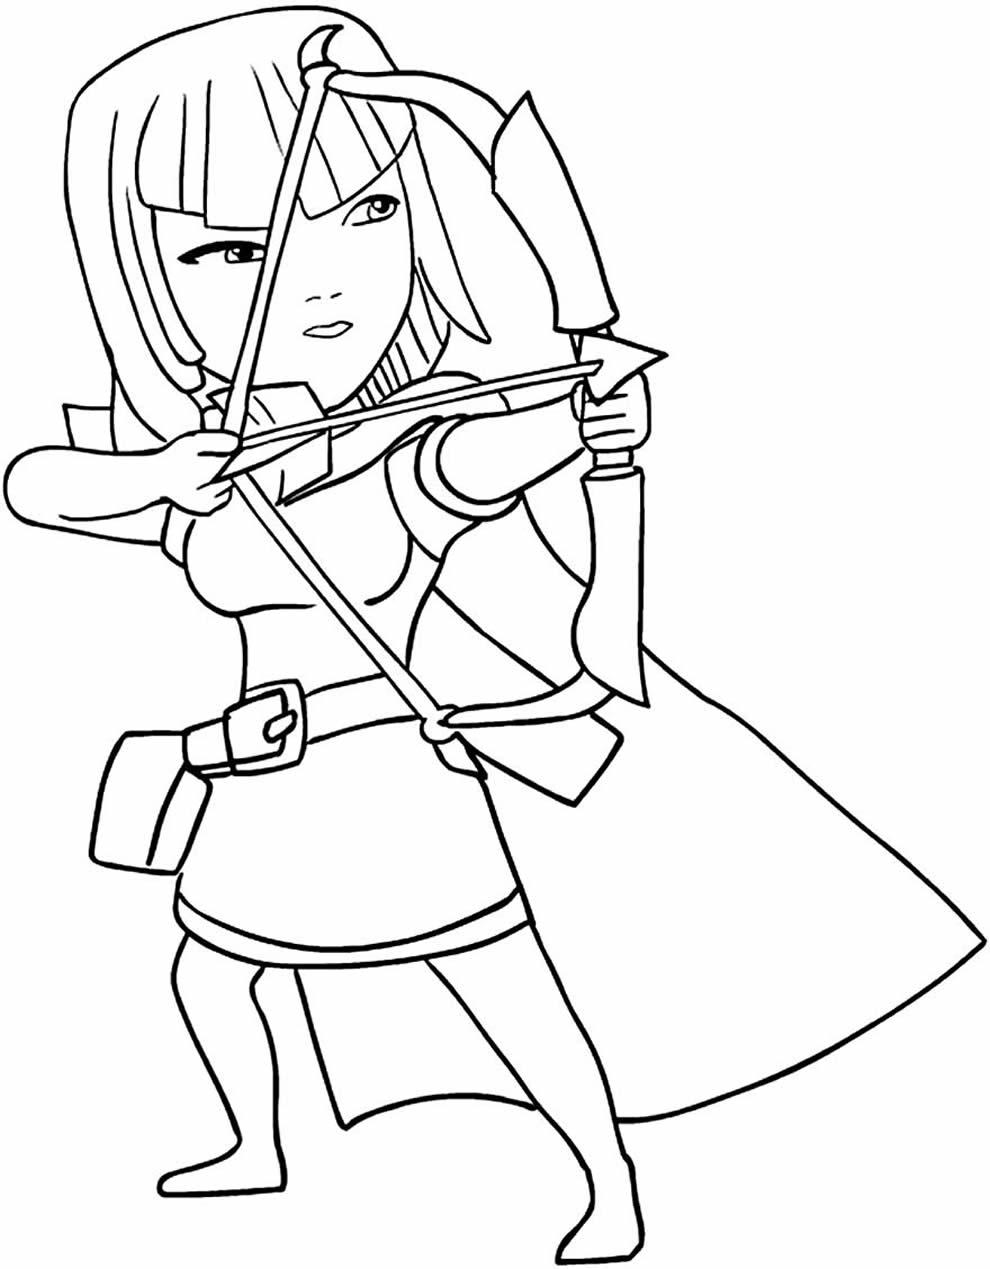 Desenho de Clash Royale para colorir